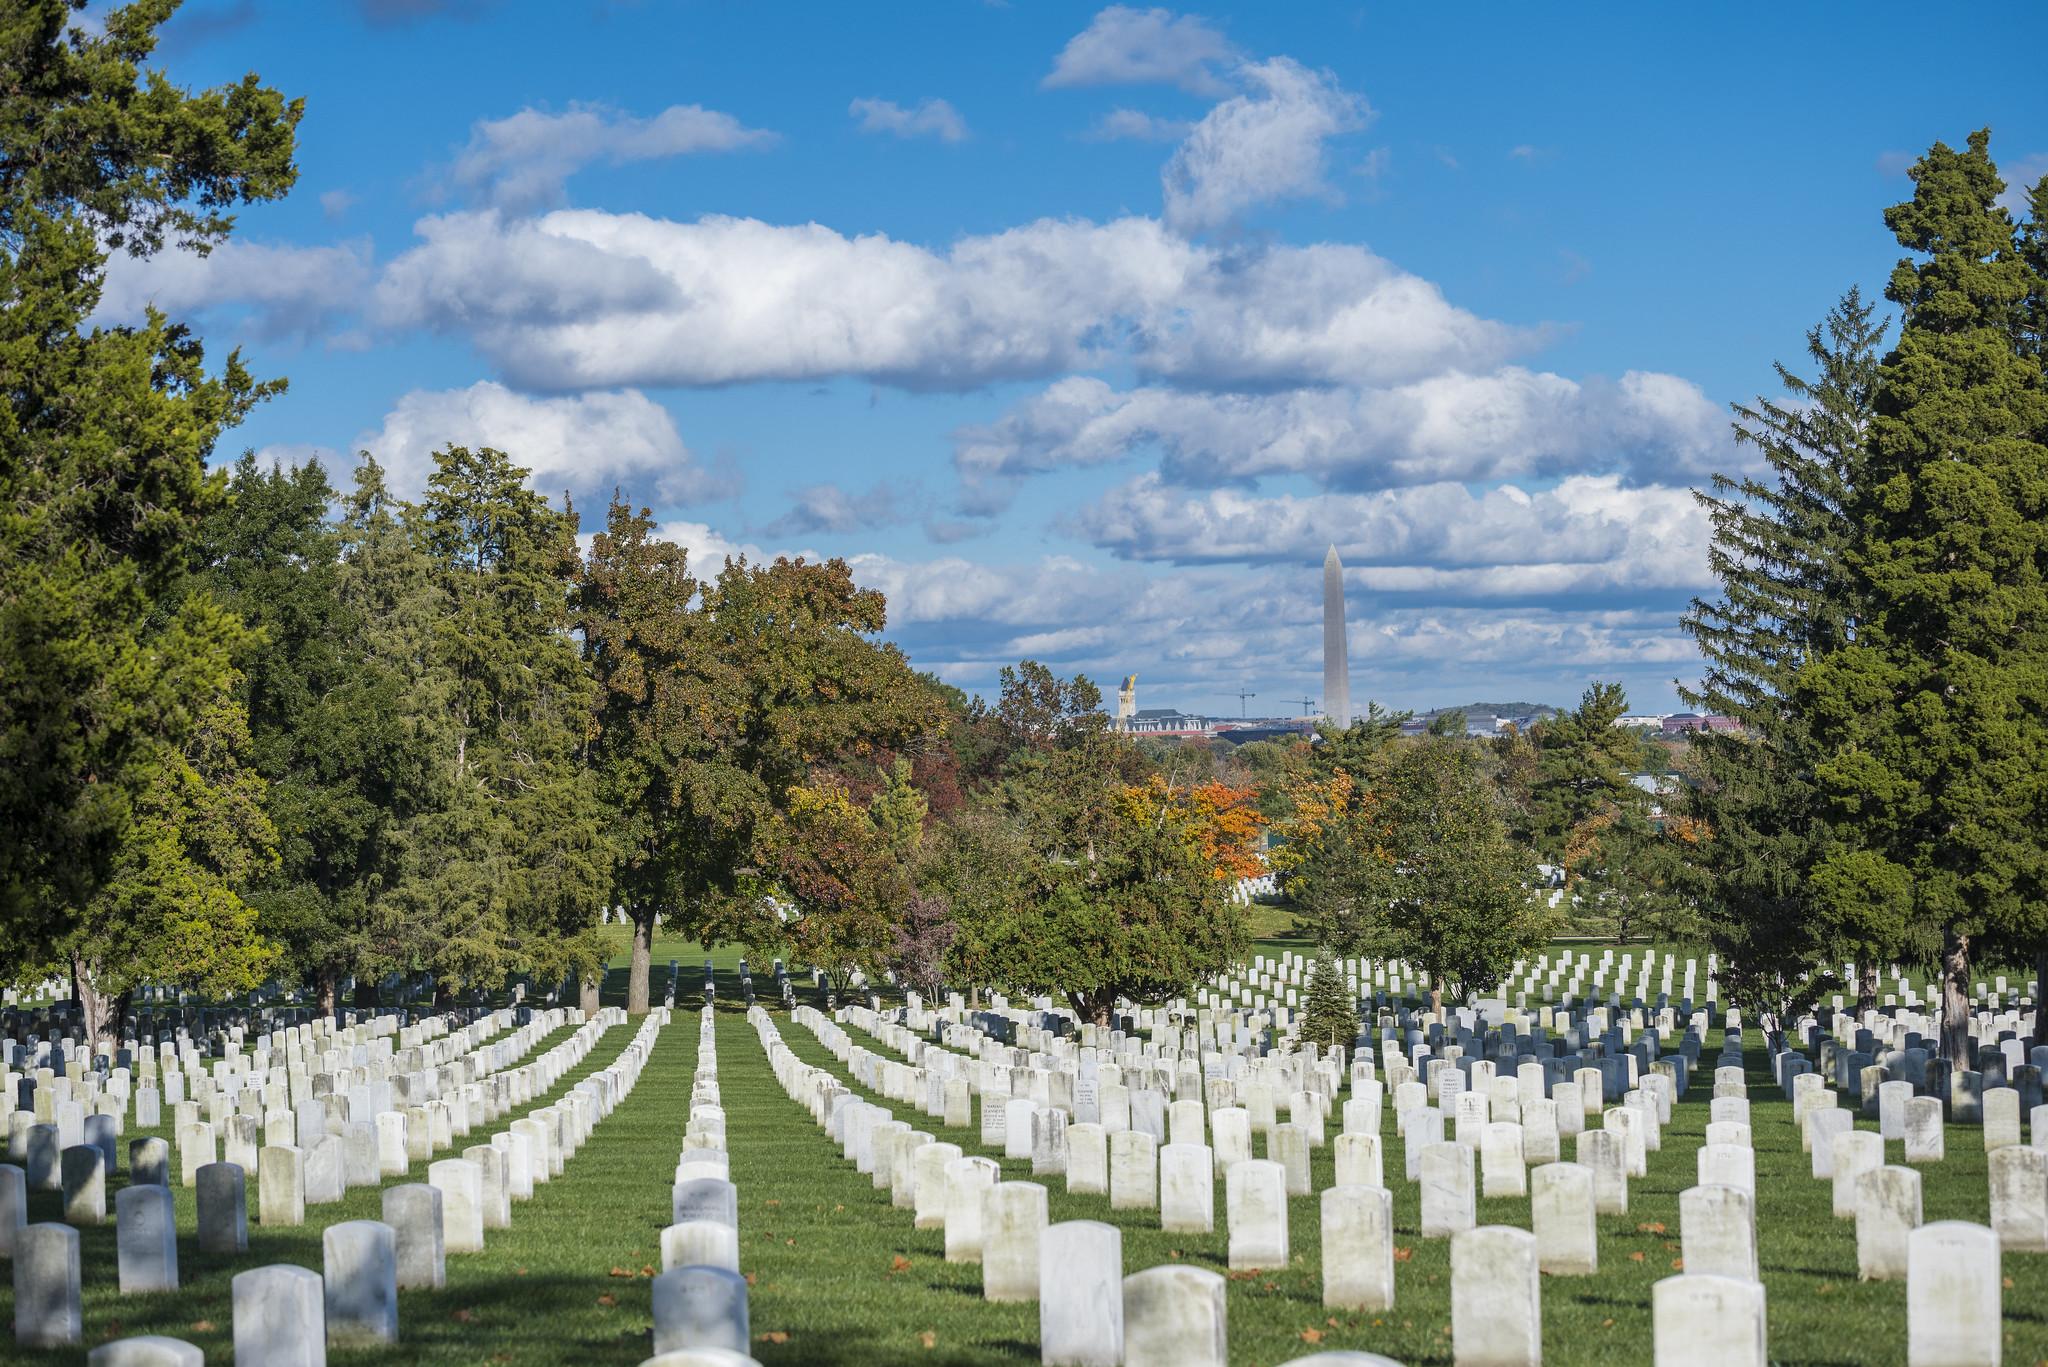 History of Arlington National Cemetery